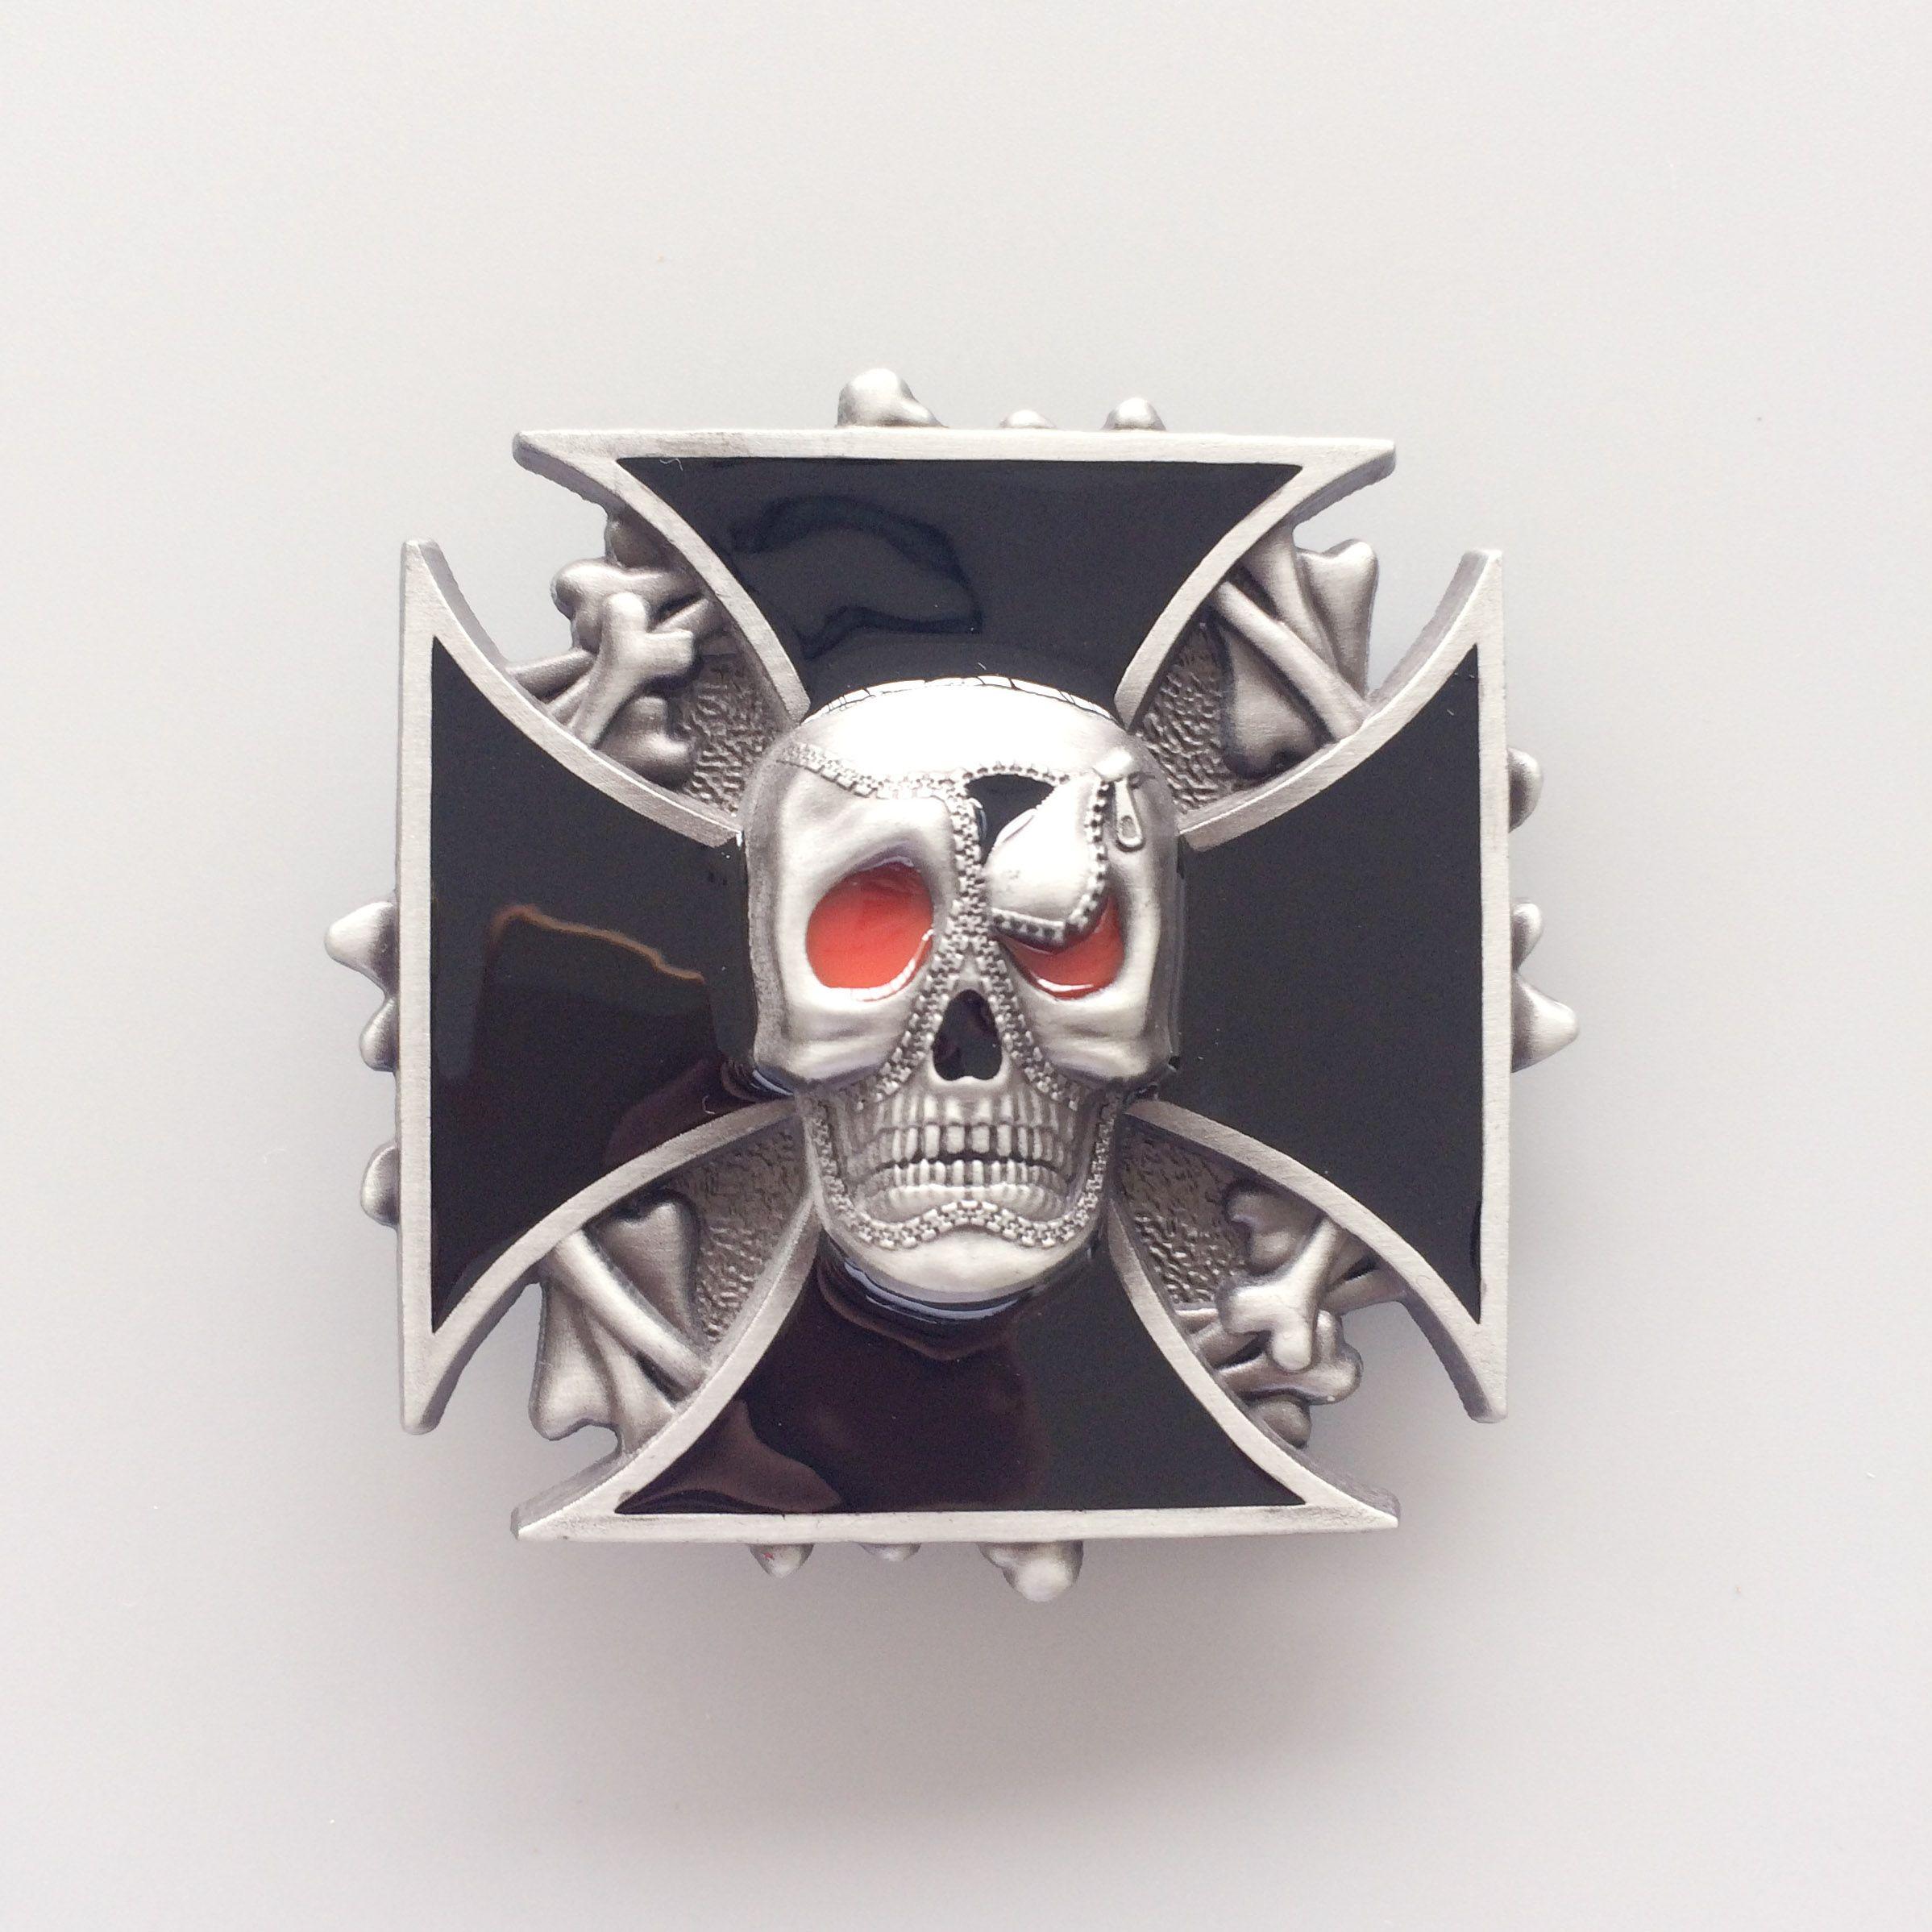 Nuevo Vintage Enamel Emo Skull Belt Buckle Gurtelschnalle Boucle de ceinture